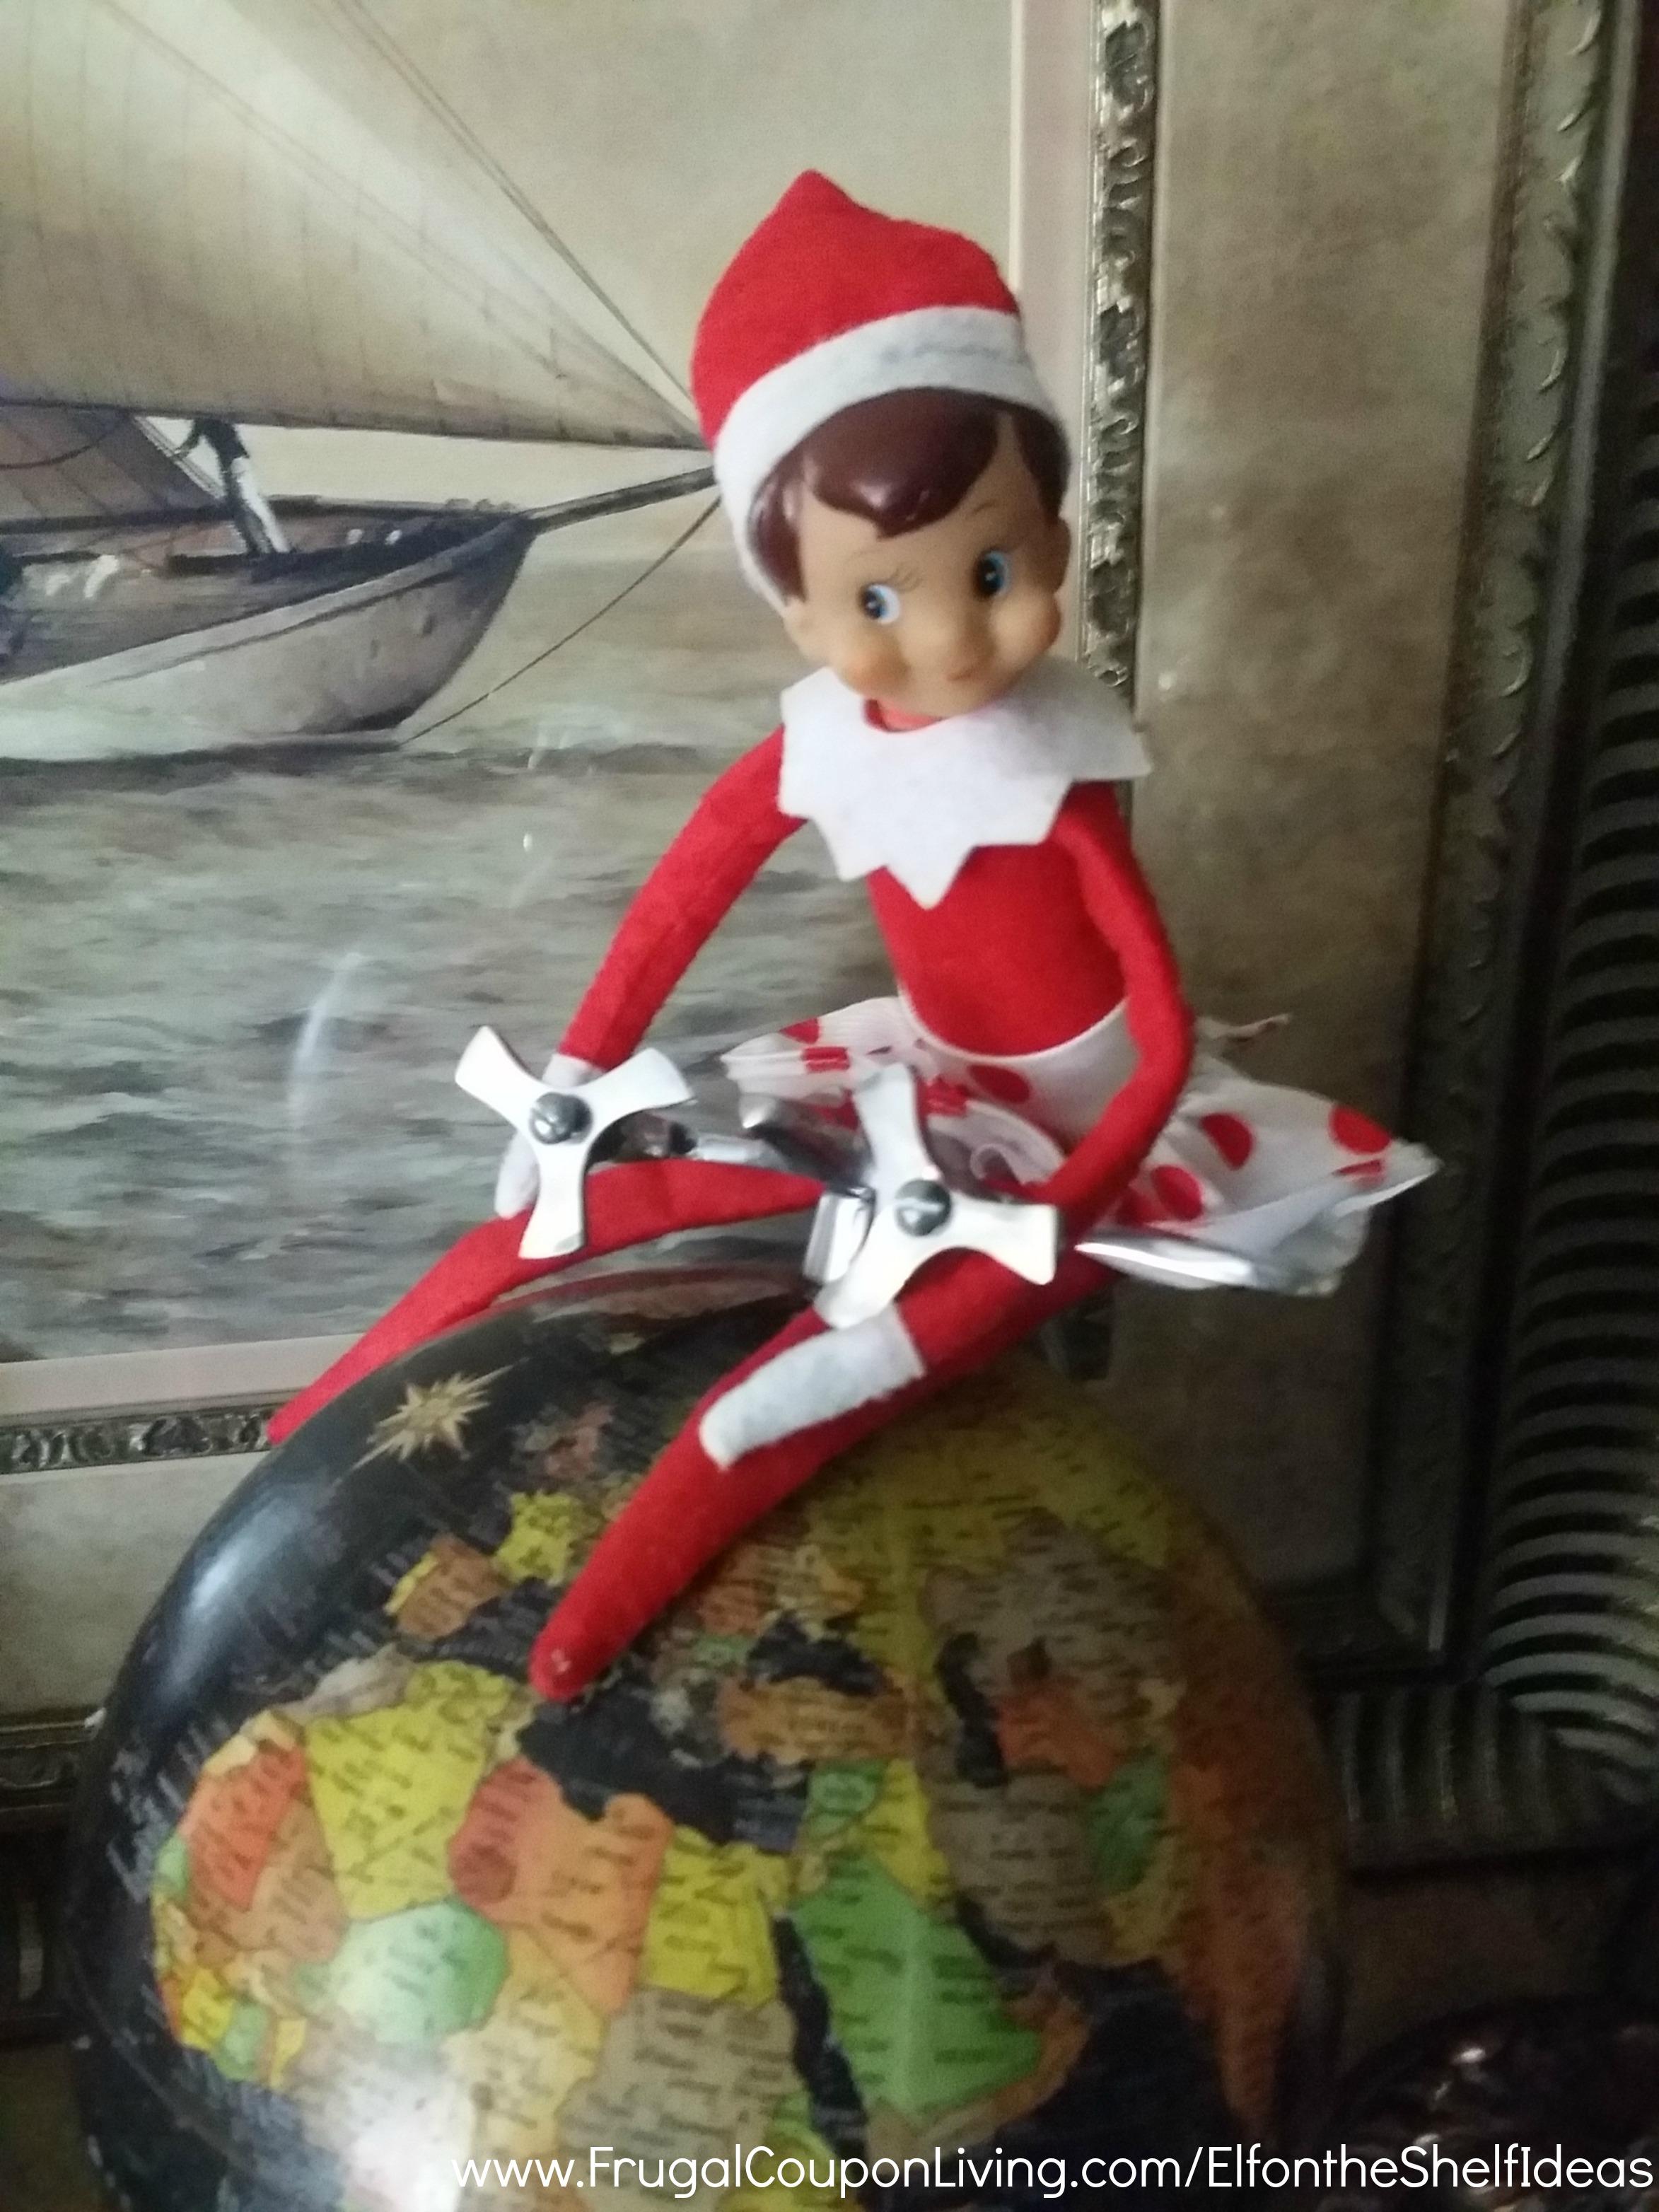 Easy The Elf on the Shelf Ideas - Love Makes the World Go Around